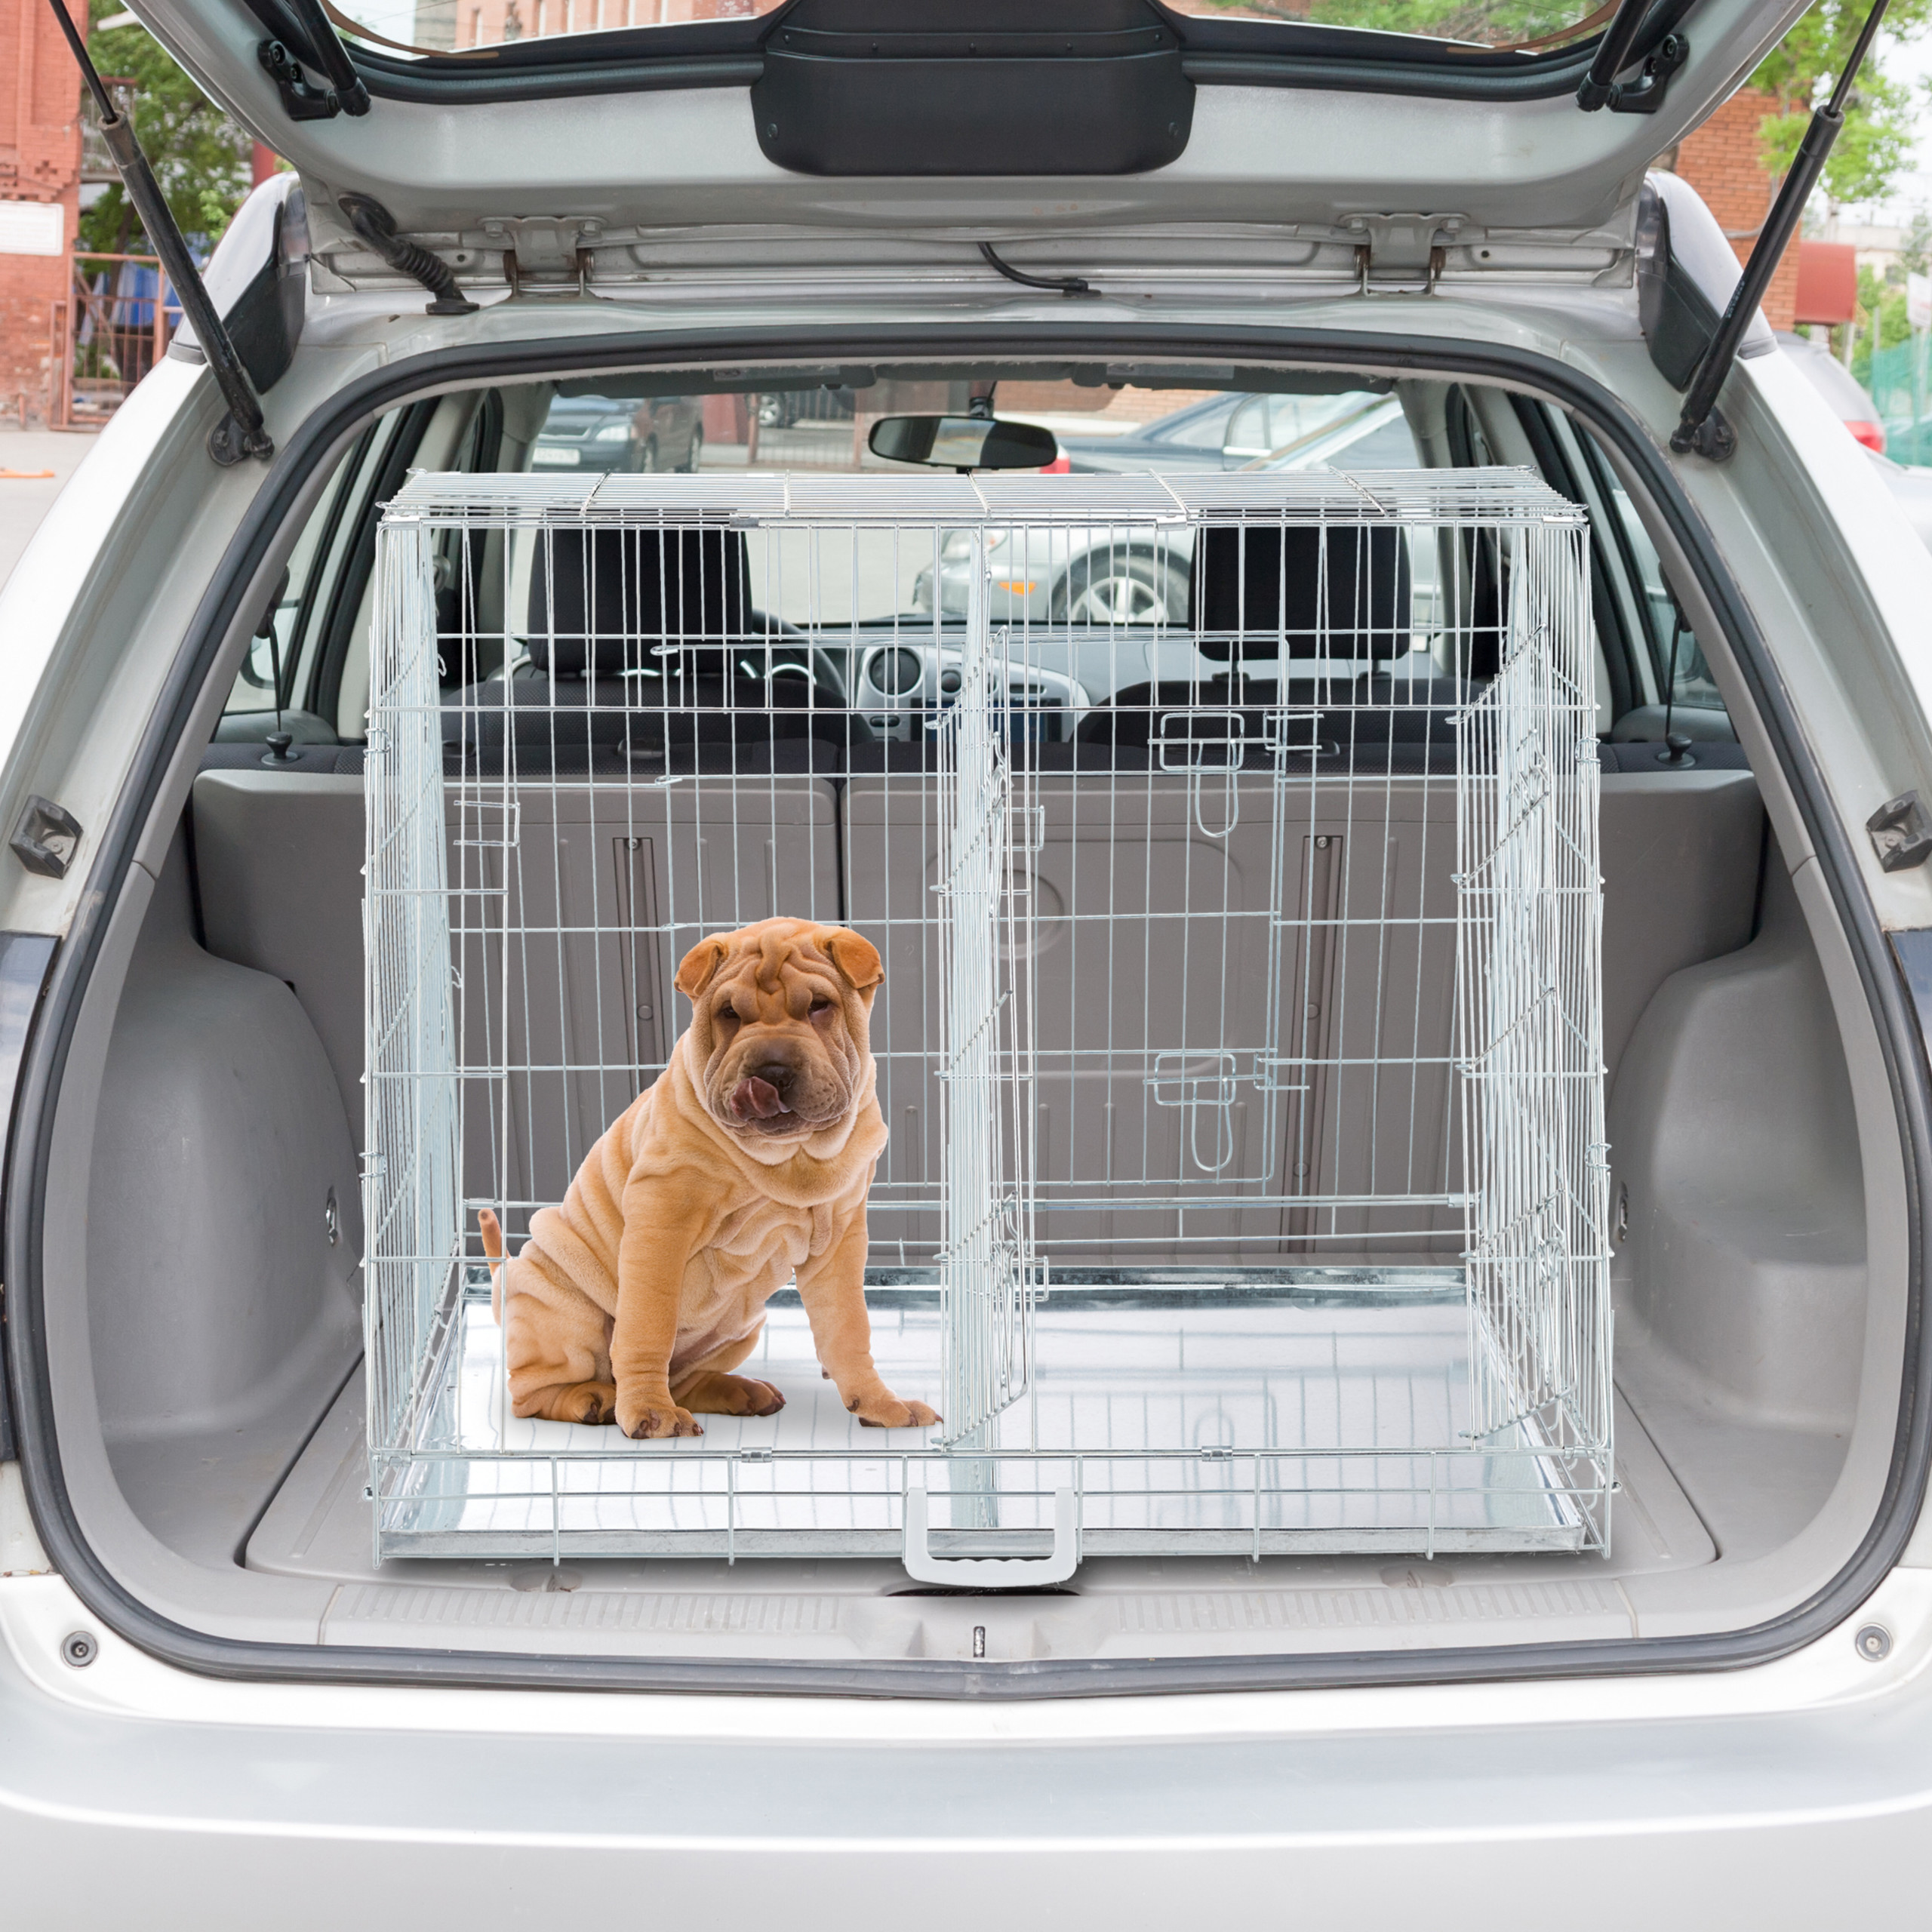 Hondenbench-dubbel-transportbench-transportbox-draadkooi-hond-L-XL-opvouwbaar miniatuur 12